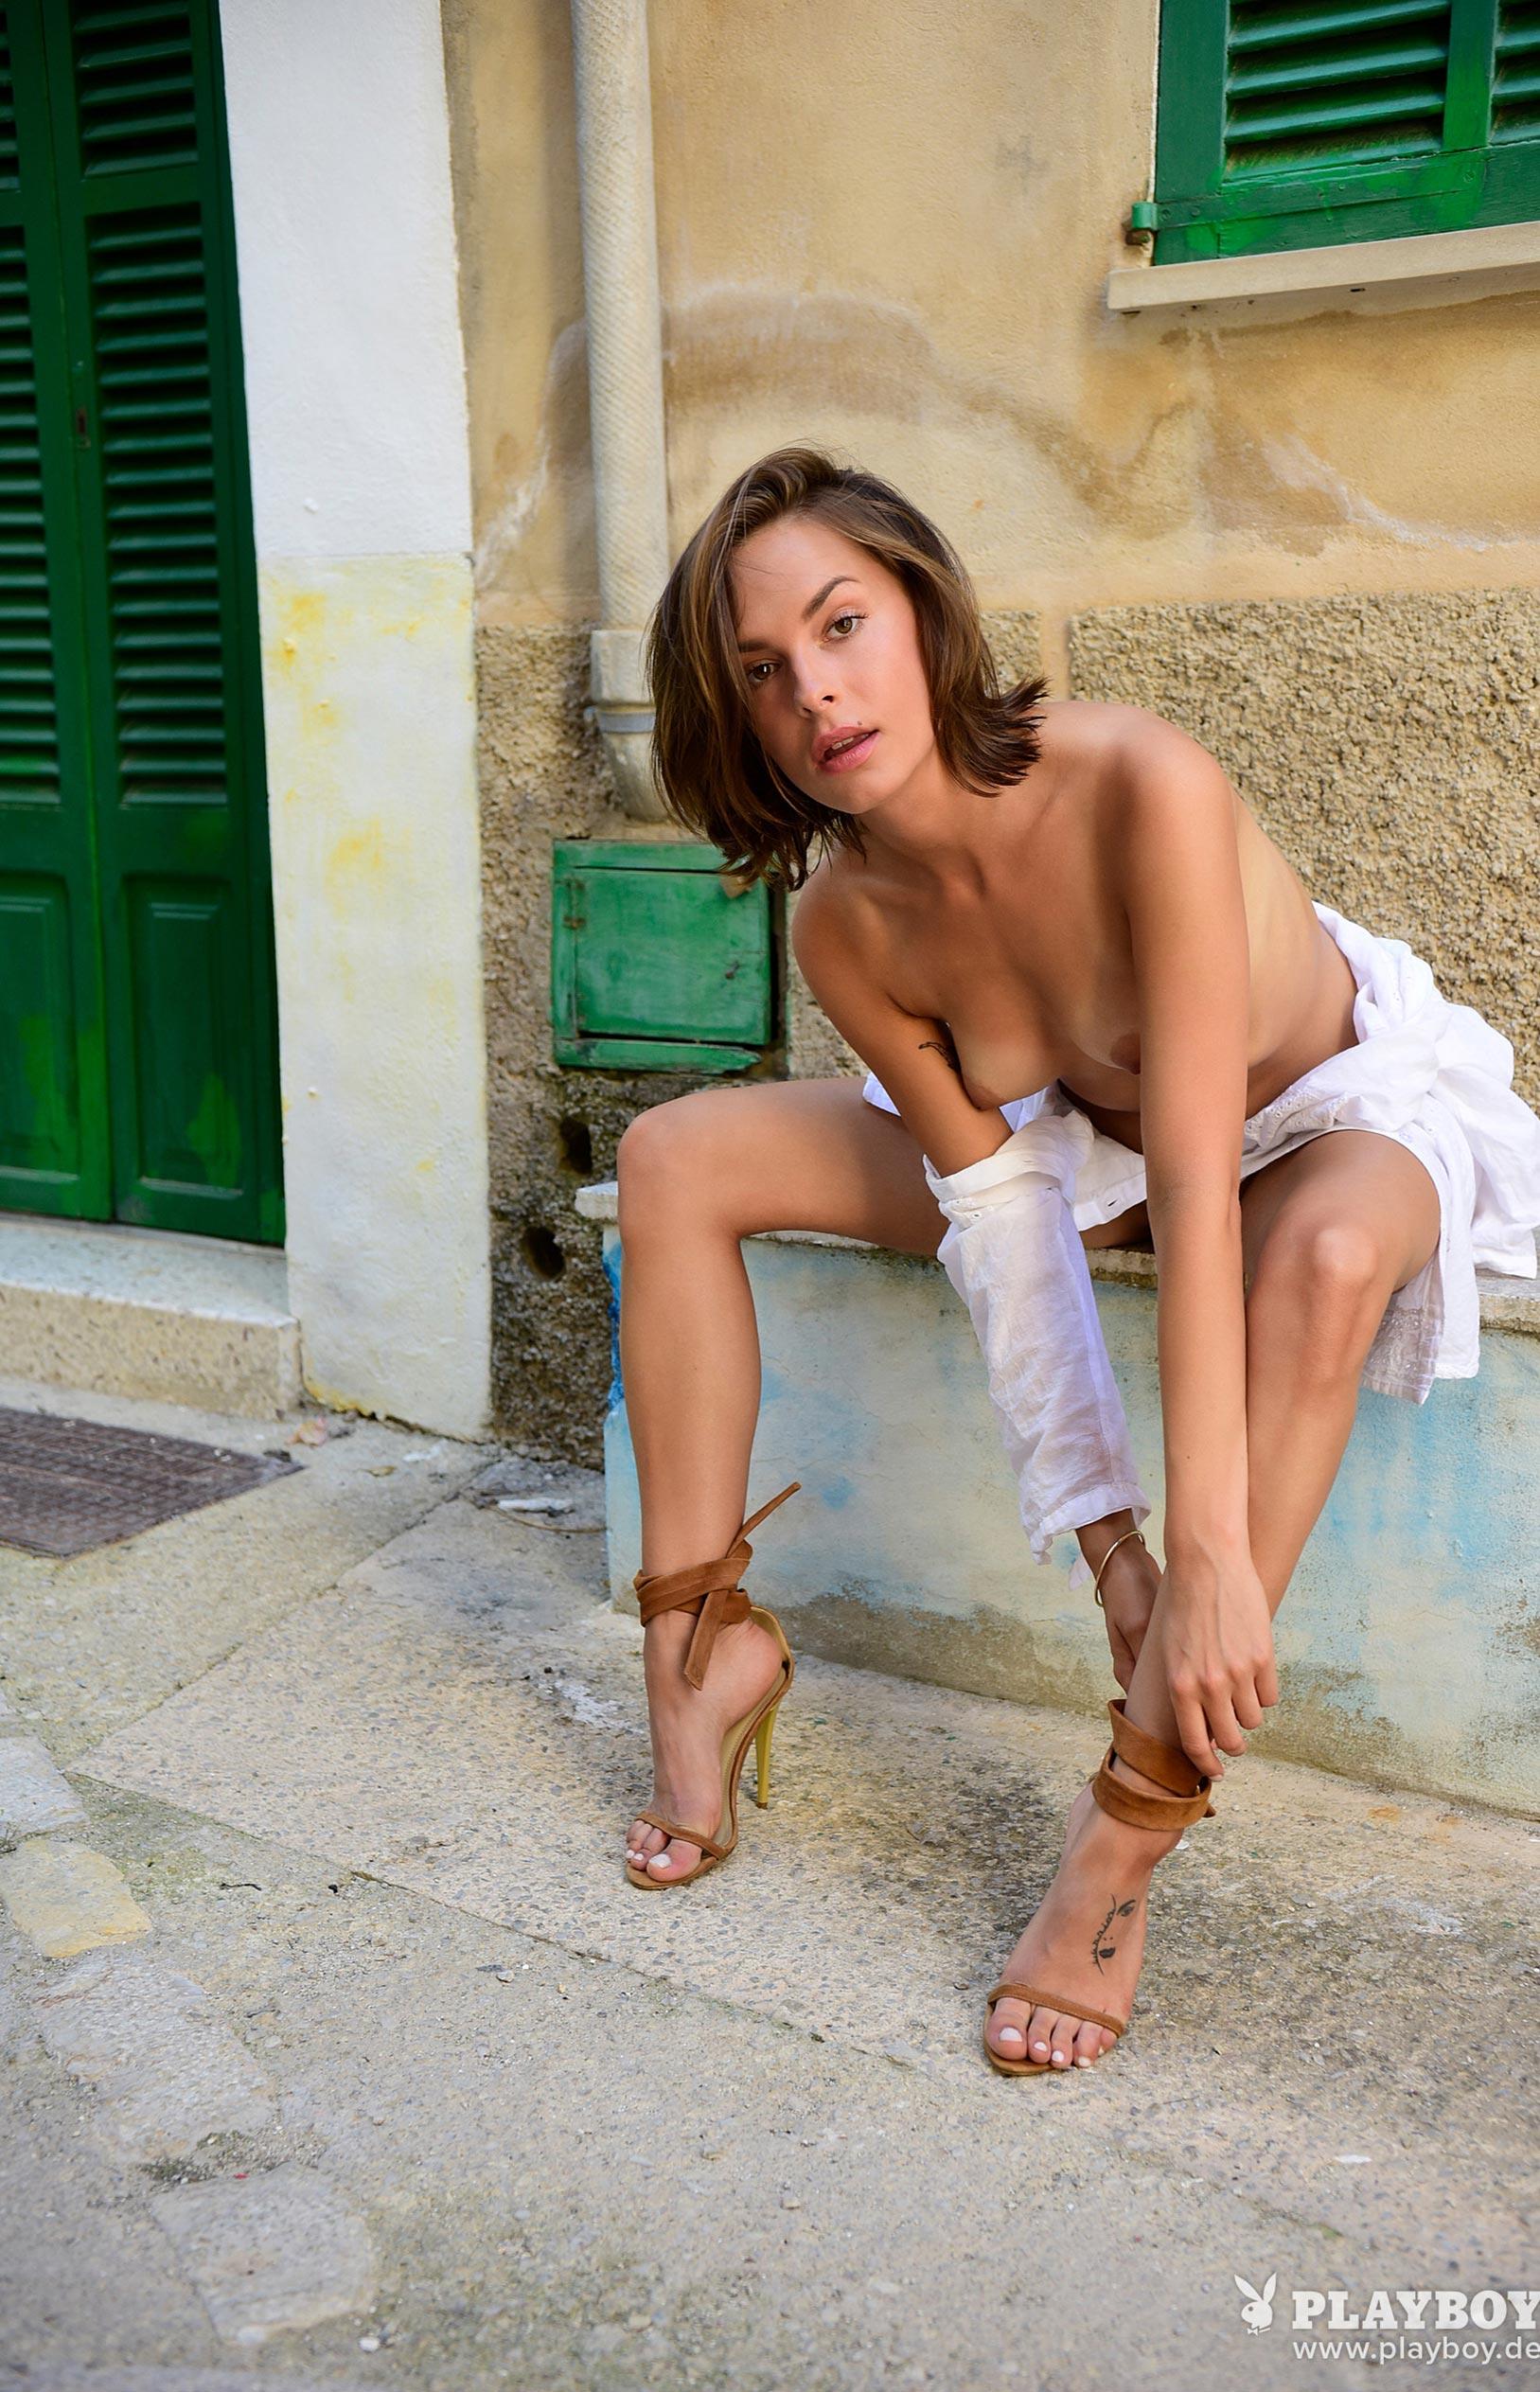 Оливия Пельцер - Девушка месяца Playboy Германия, сентябрь 2018 / фото 18